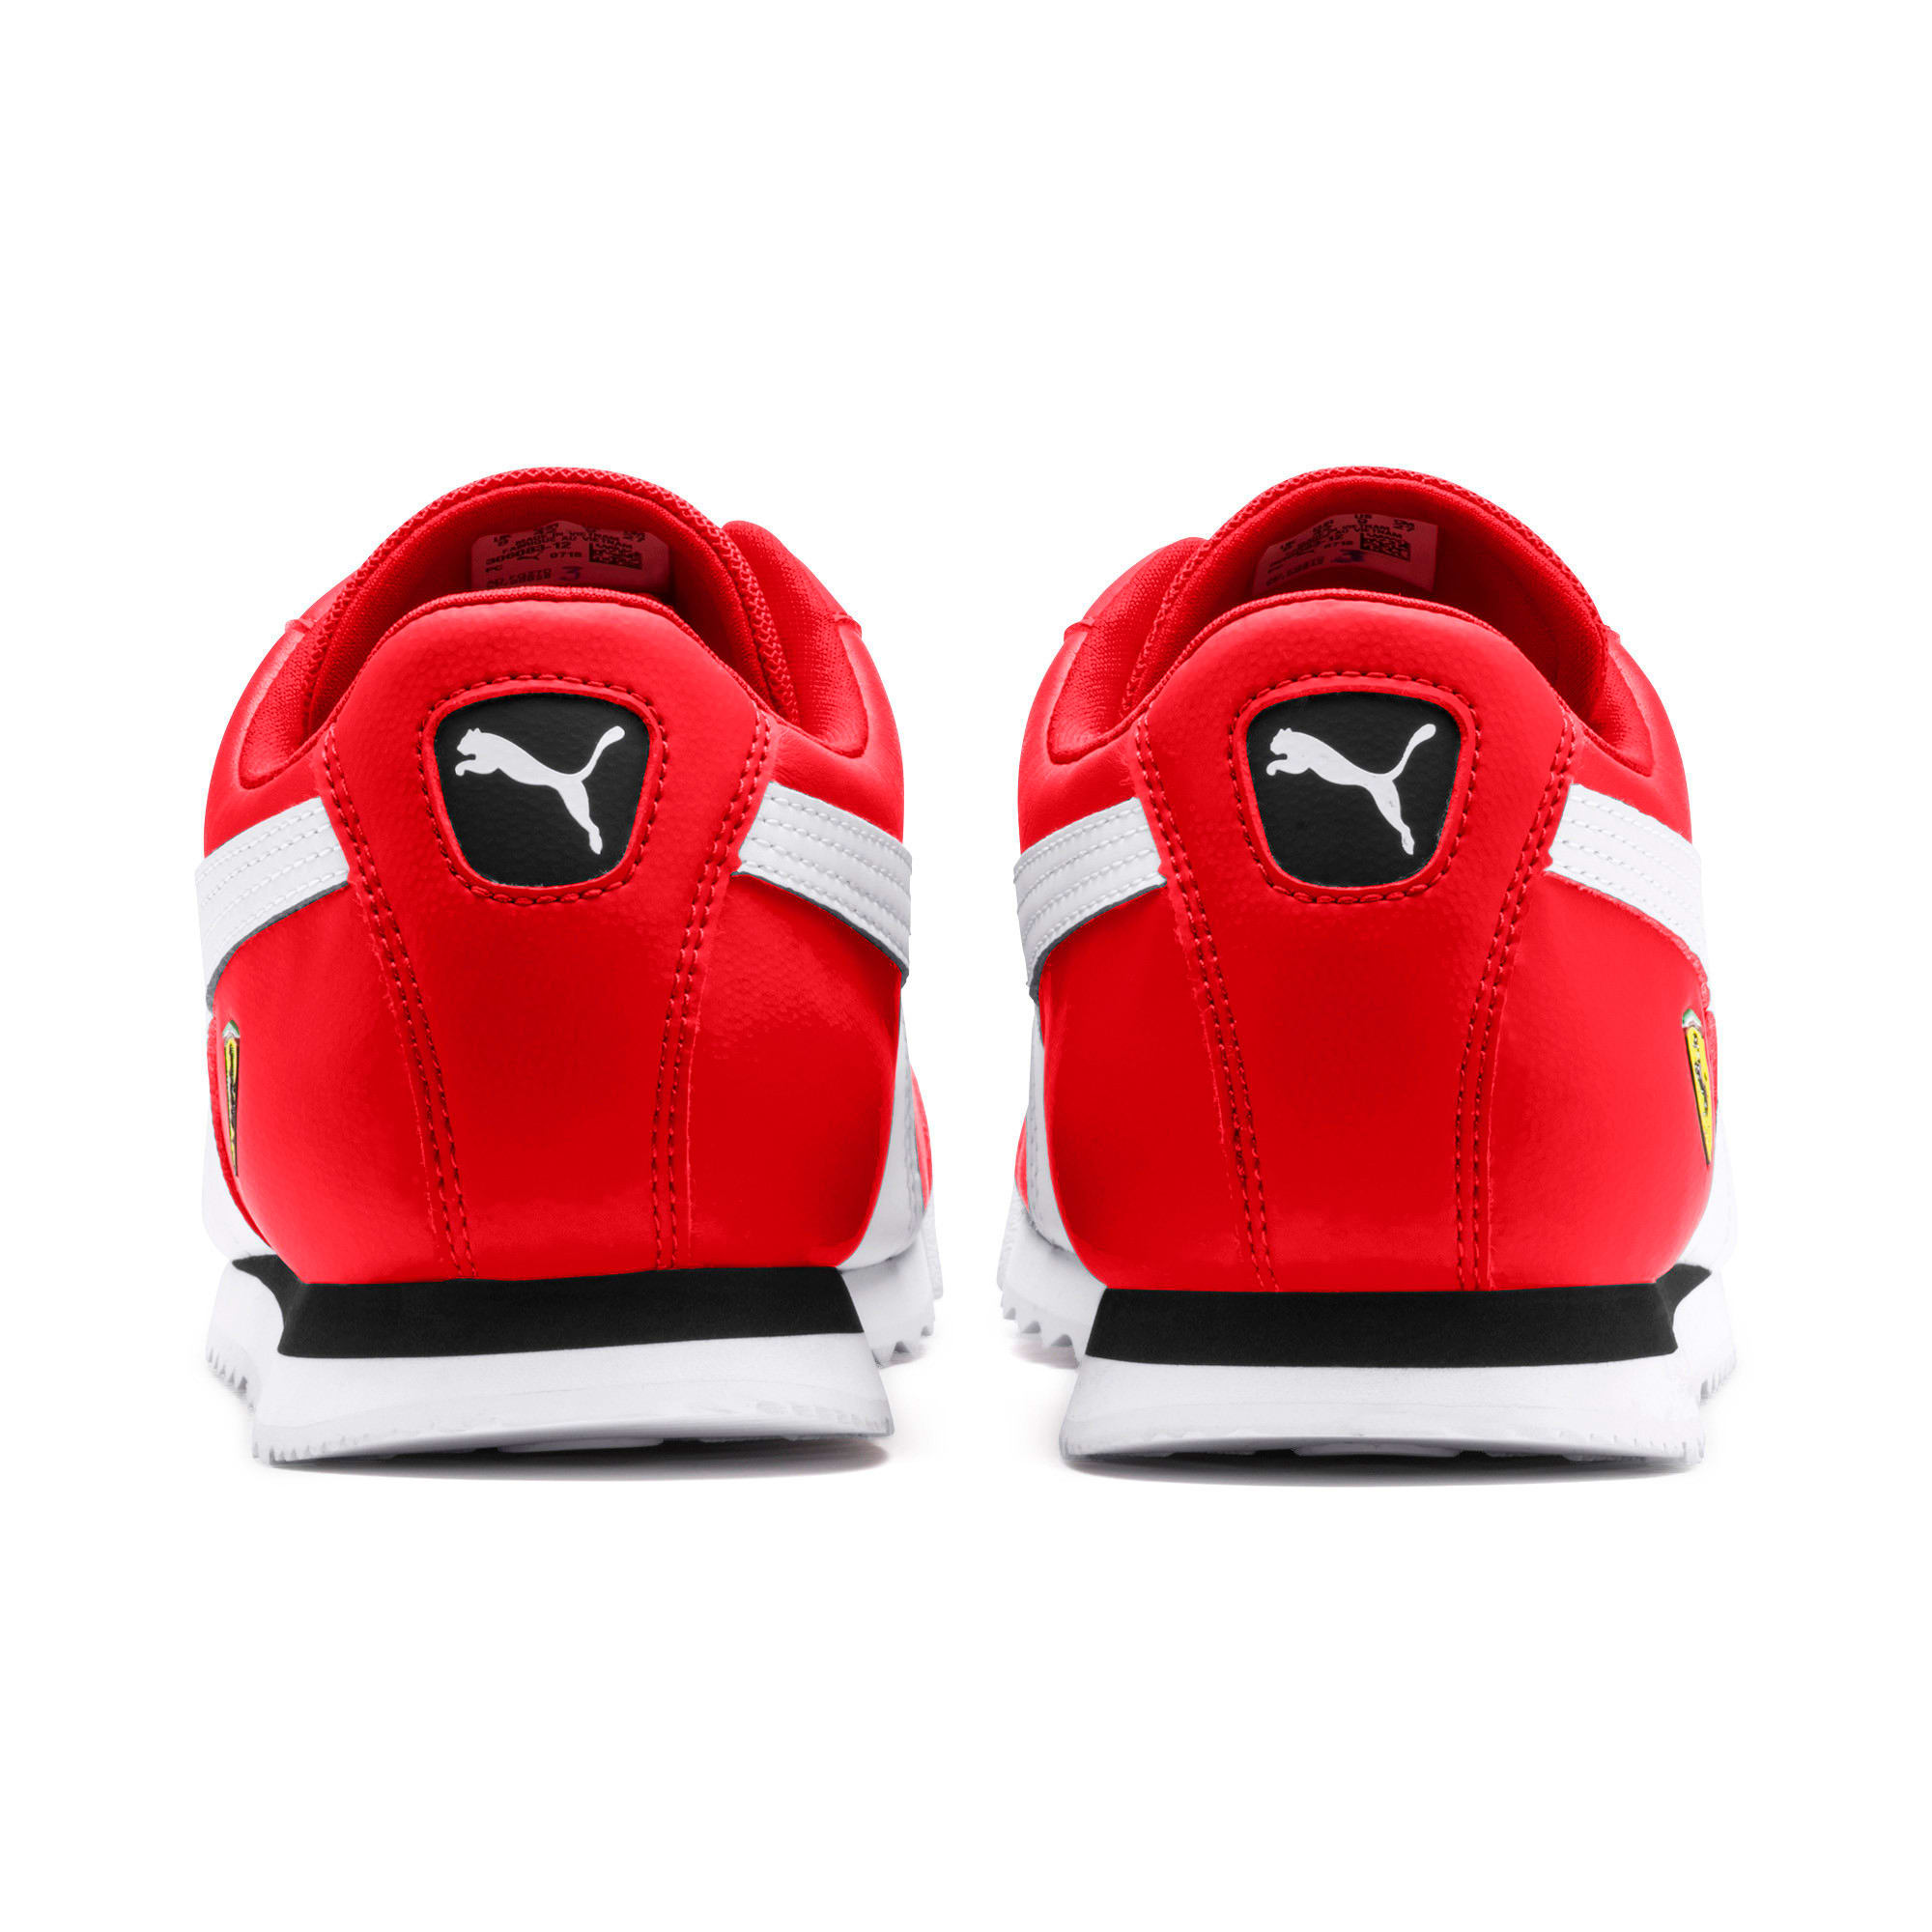 Miniatura 4 de Zapatos deportivos Scuderia Ferrari Roma para hombre, Rosso Corsa-White-Black, mediano